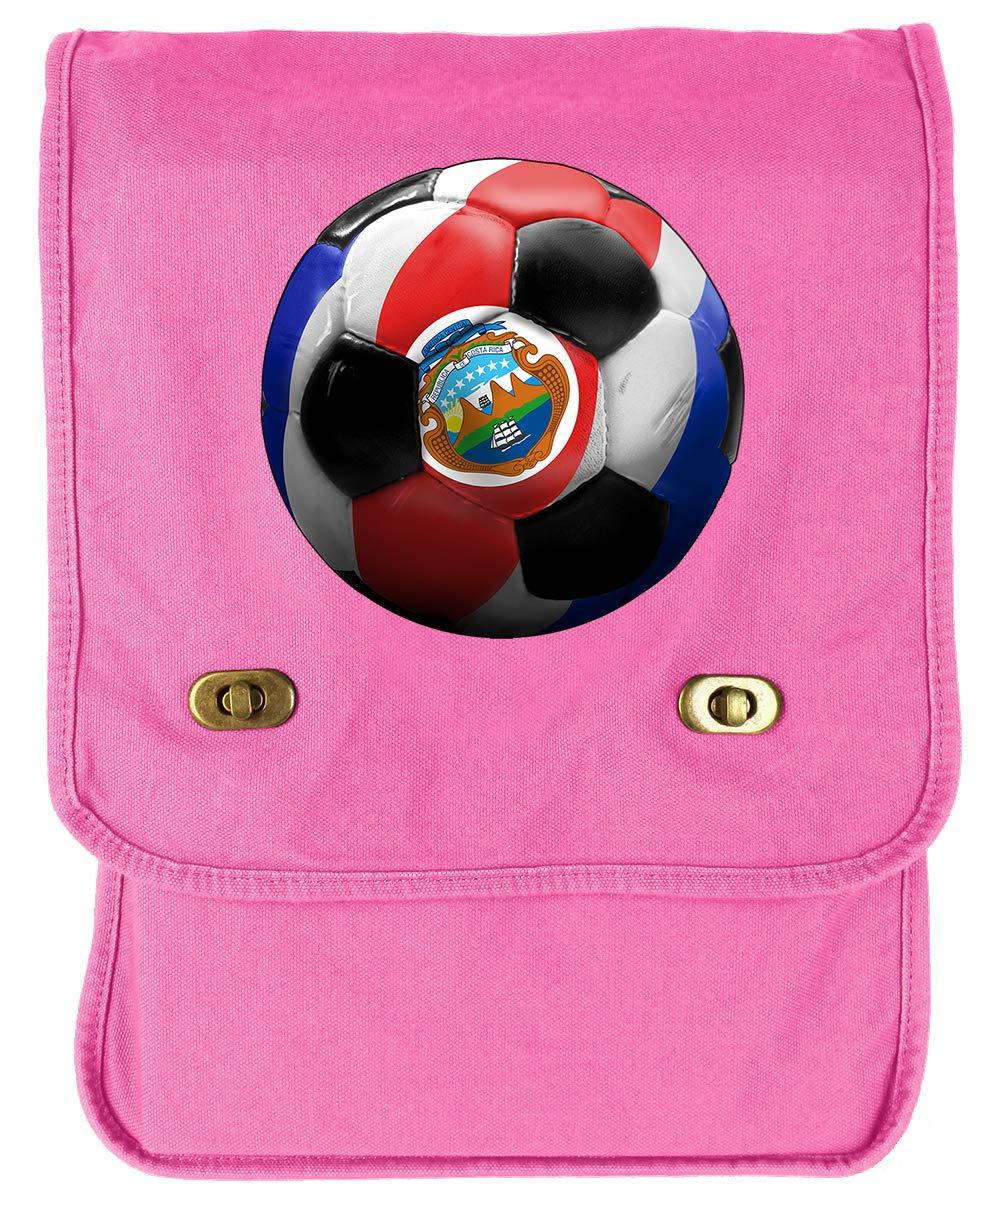 Tenacitee Costa Rica Soccer Navy Brushed Canvas Messenger Bag